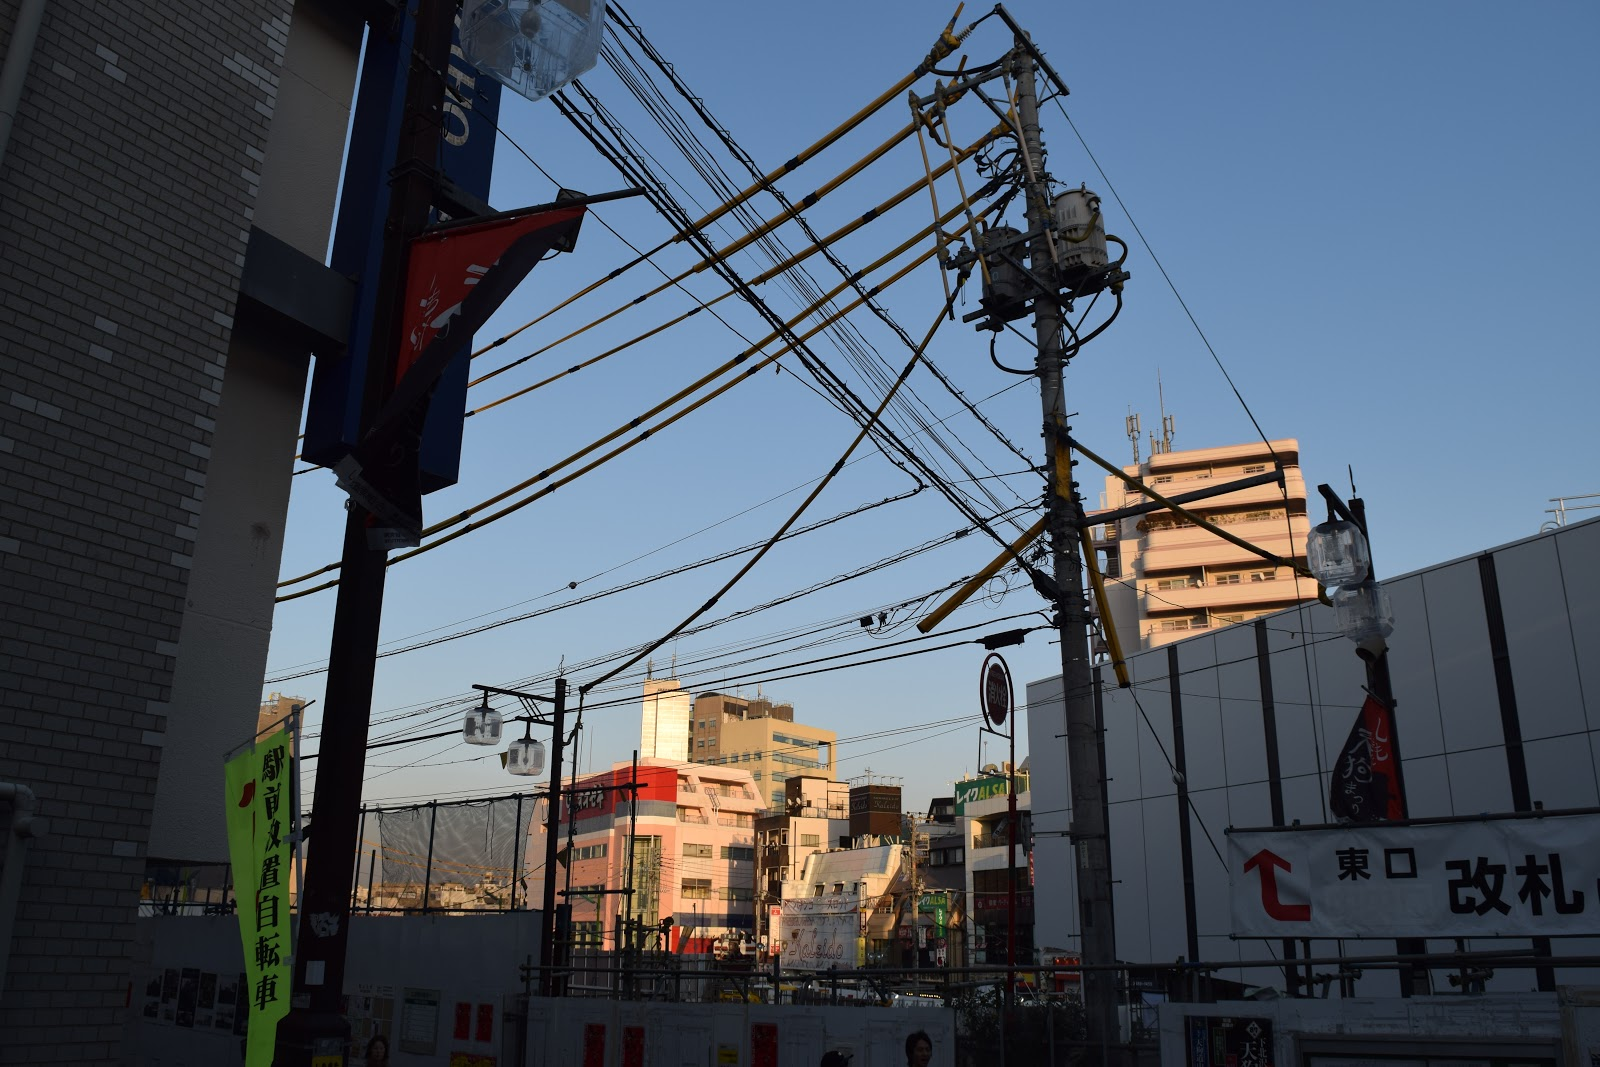 Shimokitazawa station area